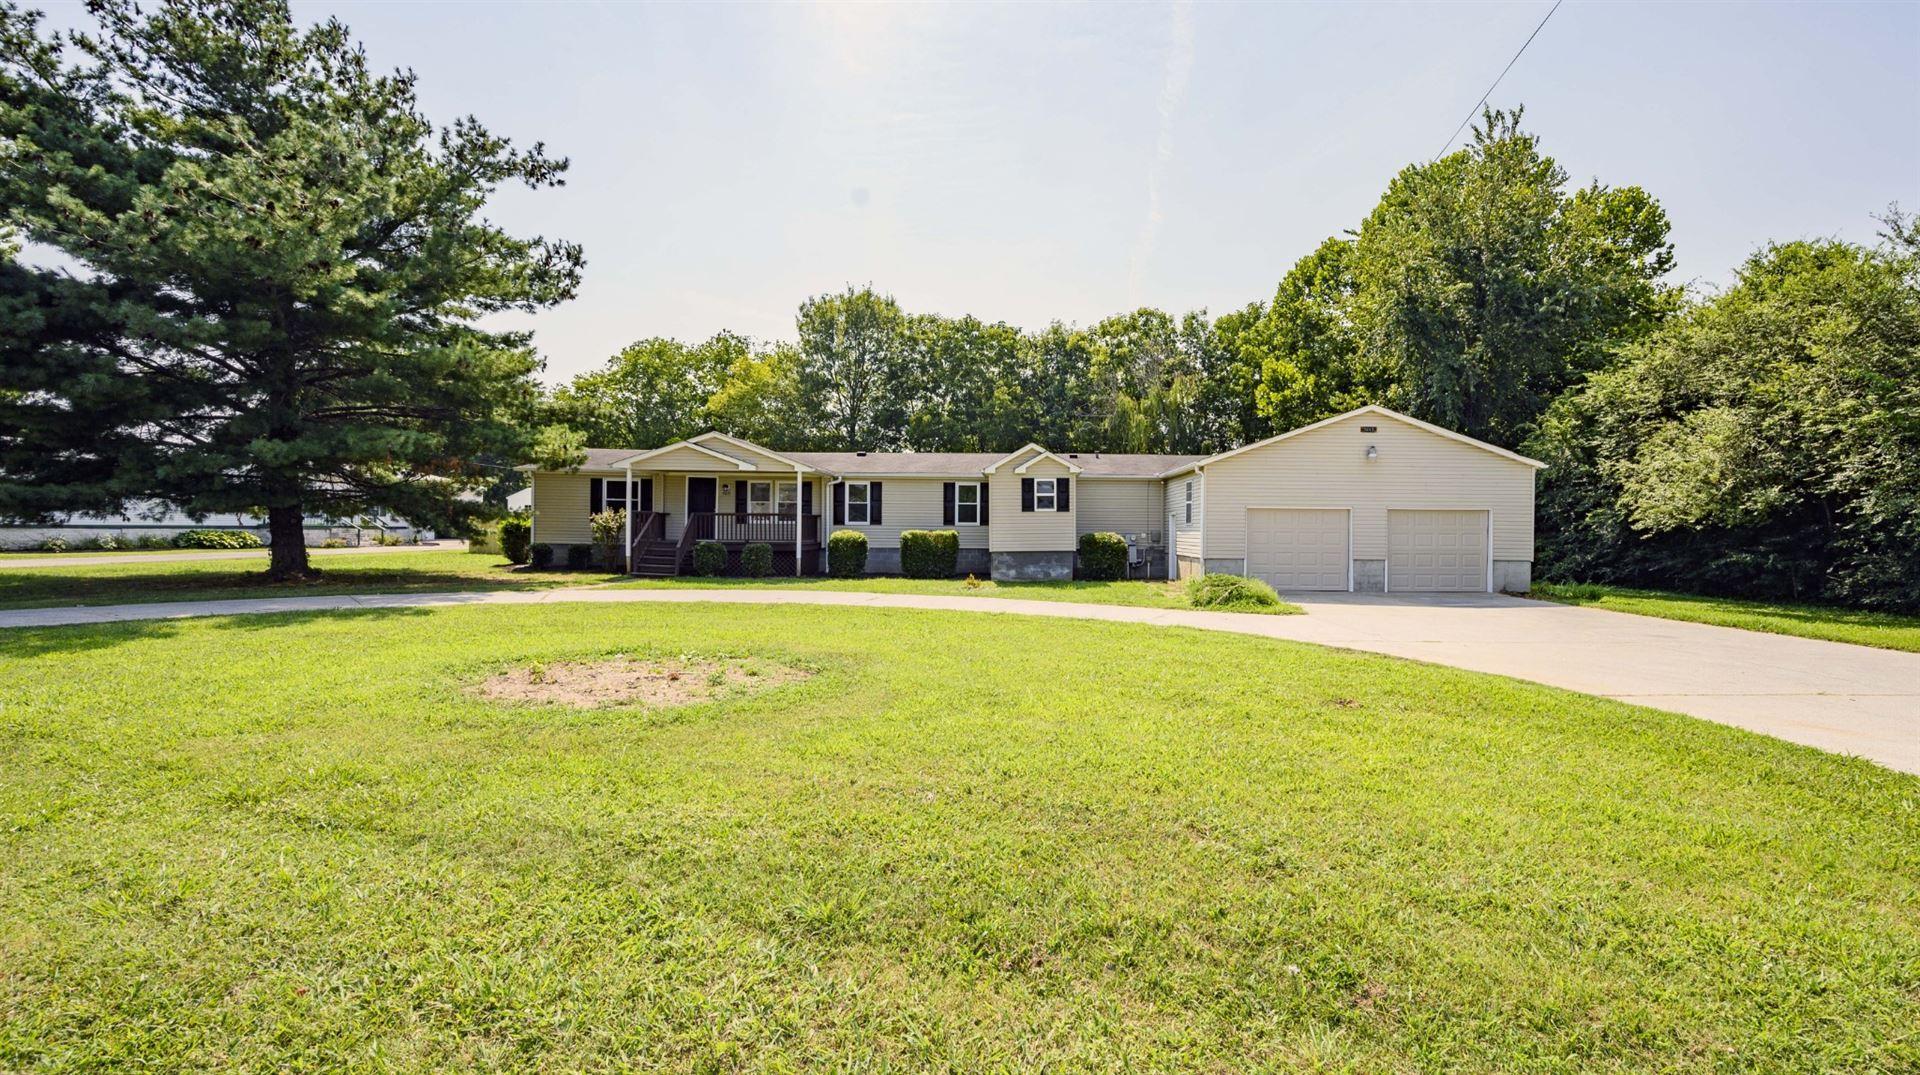 5015 Blackman Rd, Murfreesboro, TN 37129 - MLS#: 2277078